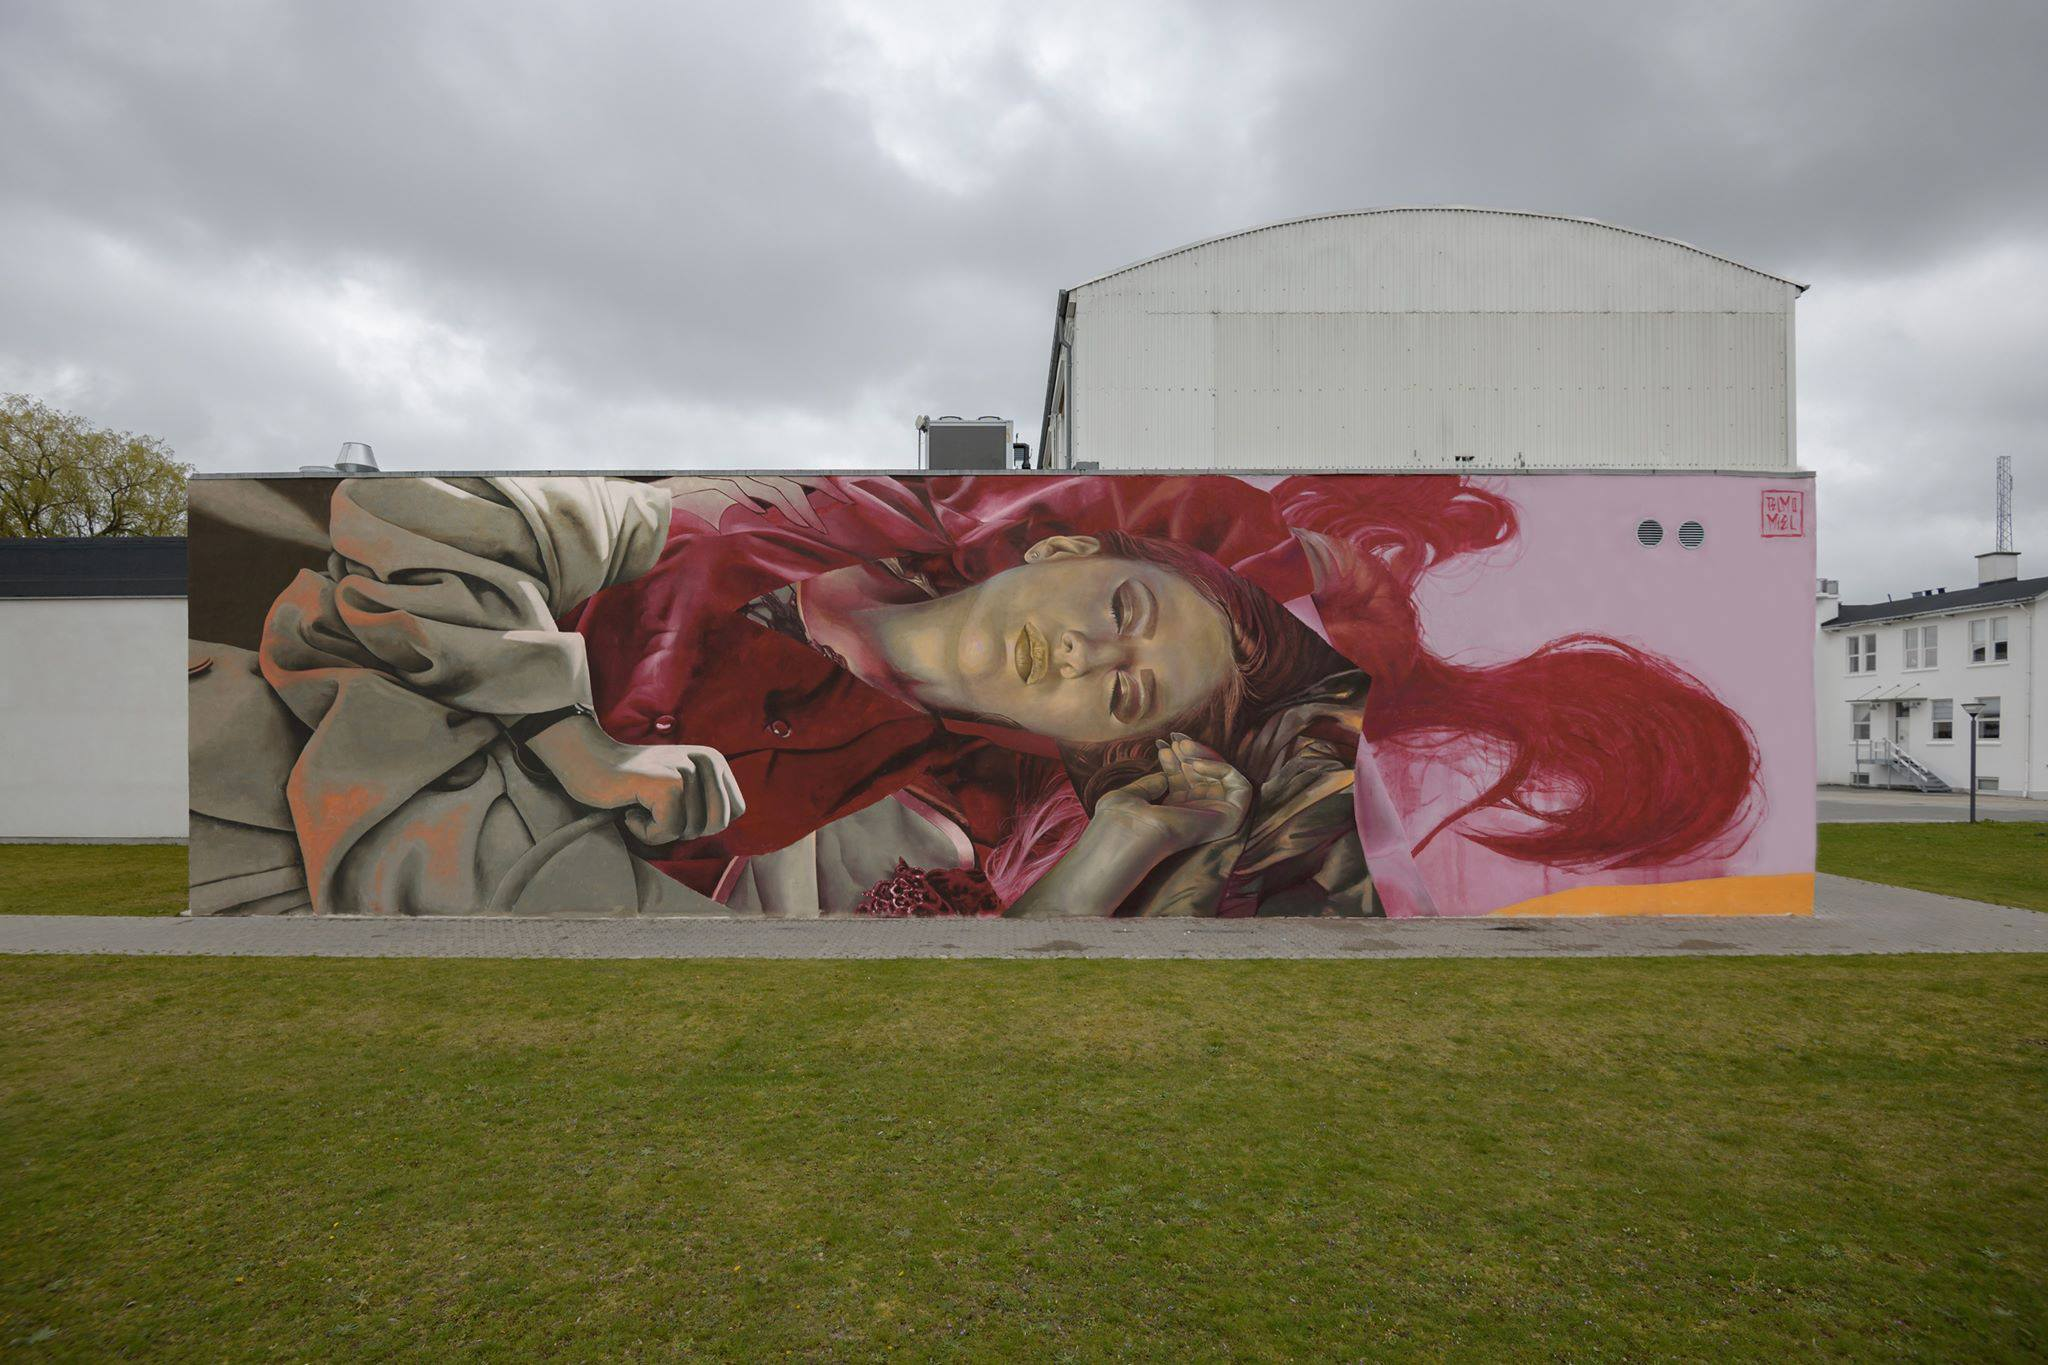 Telmo Miel Show New Mural, Paintings at Kirk Gallery